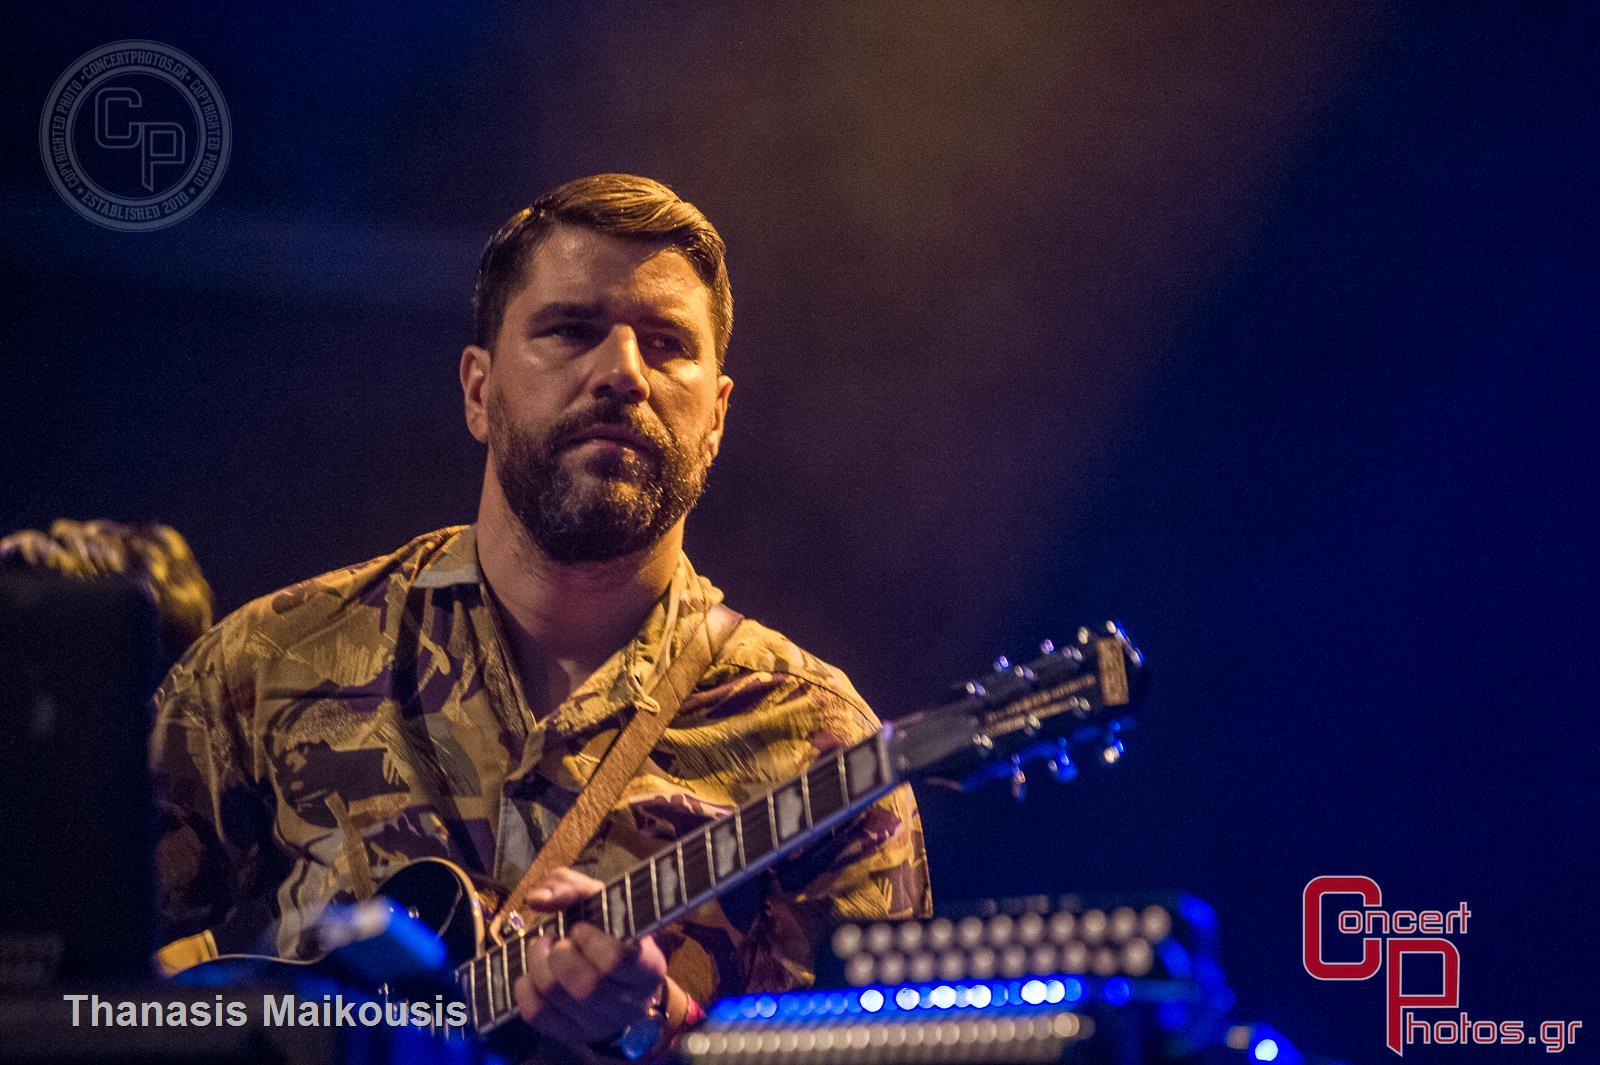 Quantic & Kill Emil -Quantic Kill Emil Gagarin photographer: Thanasis Maikousis - ConcertPhotos - 20141023_2252_44